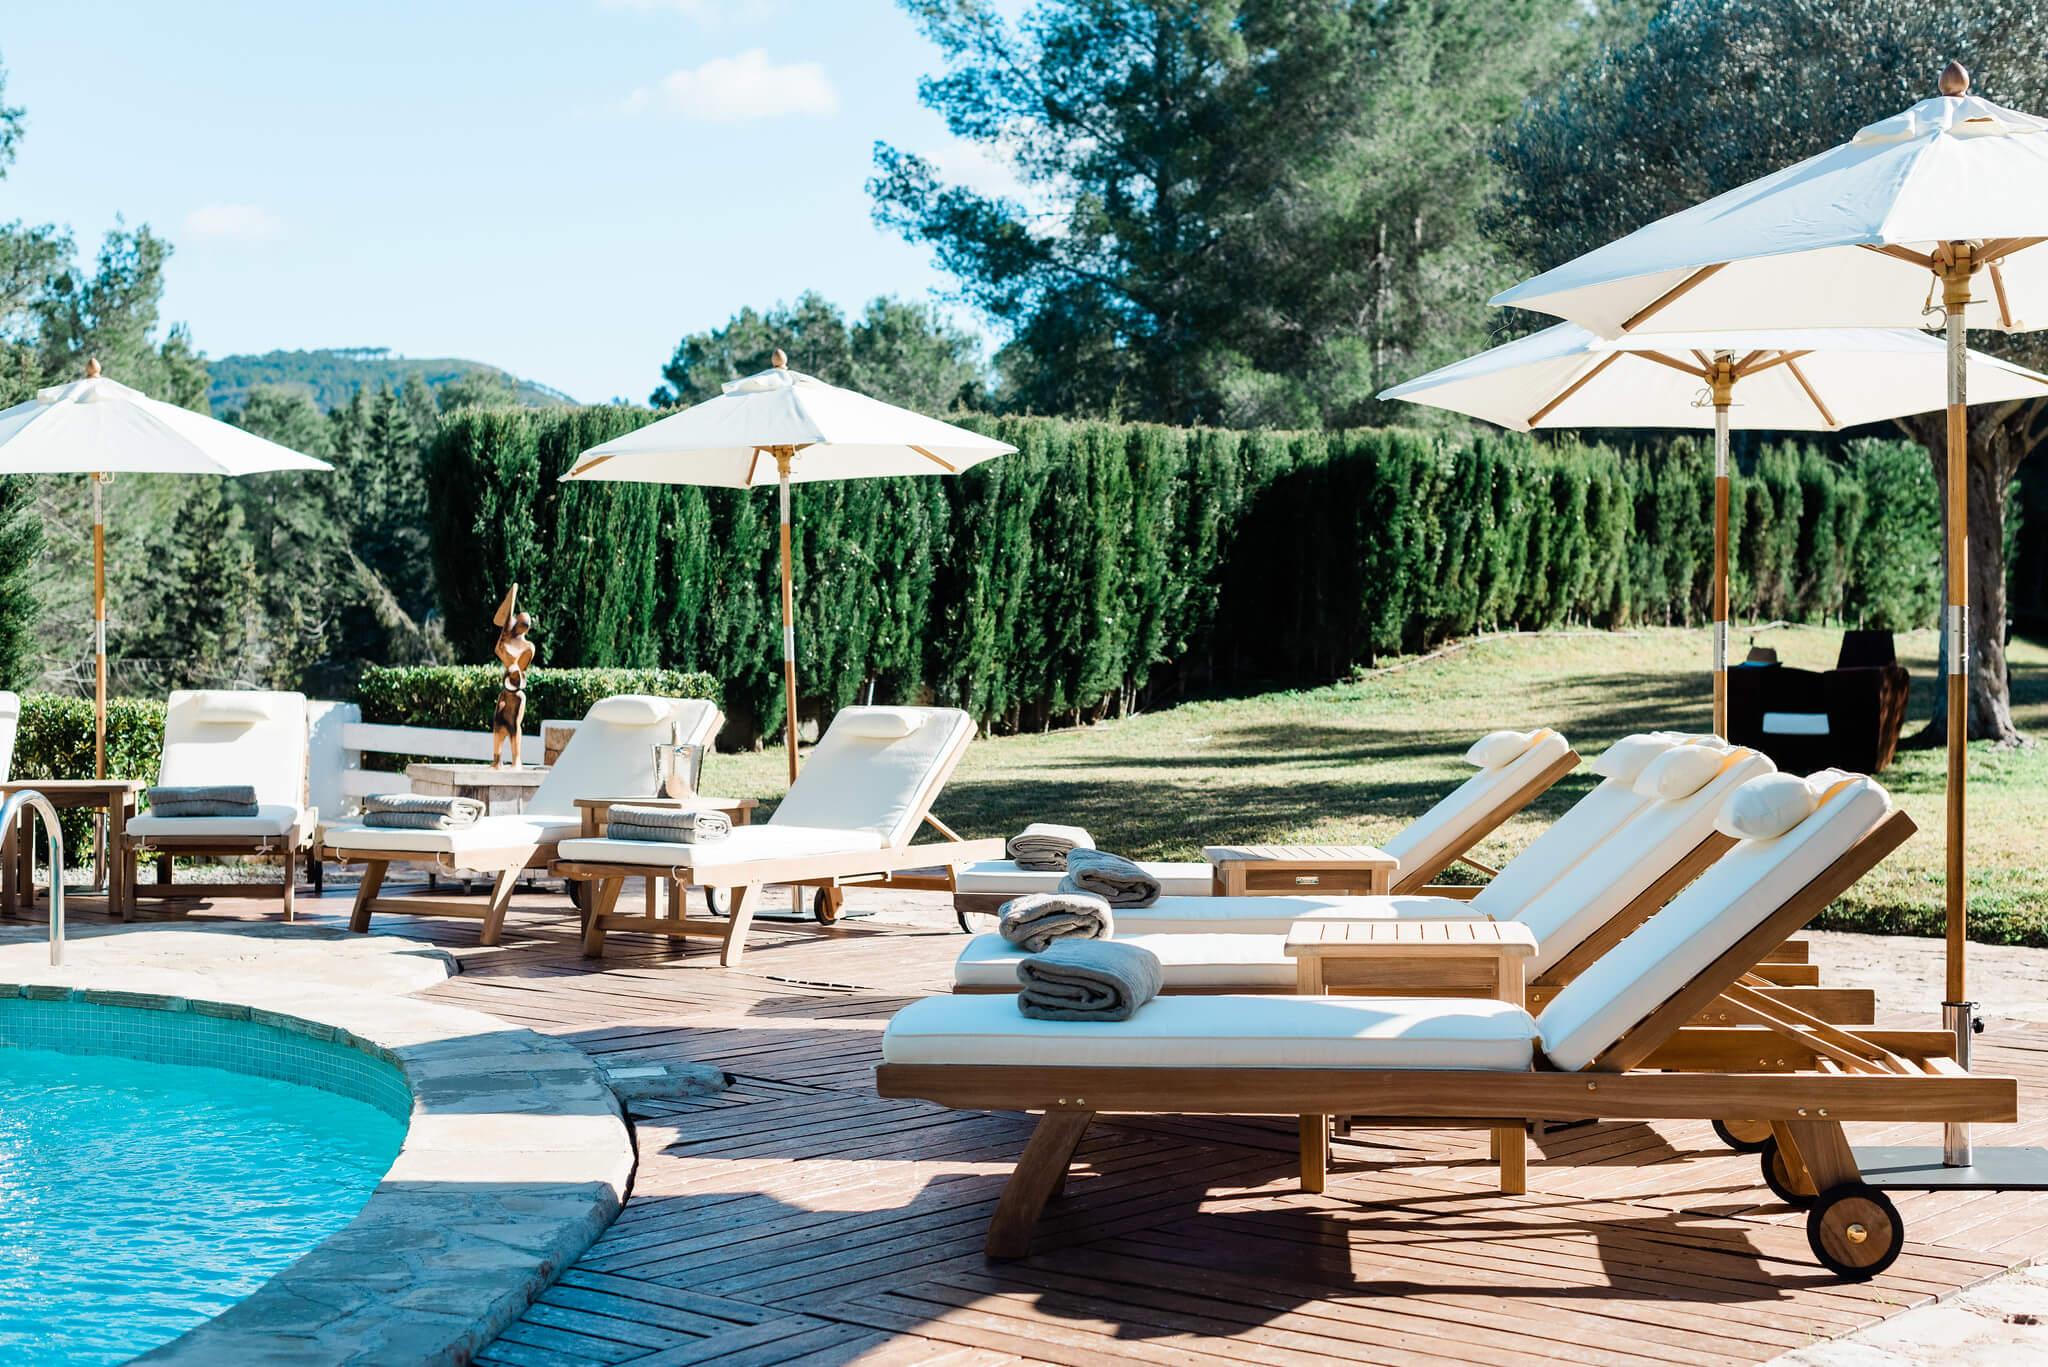 https://www.white-ibiza.com/wp-content/uploads/2020/05/white-ibiza-villas-can-verde-exterior-sun-loungers.jpg